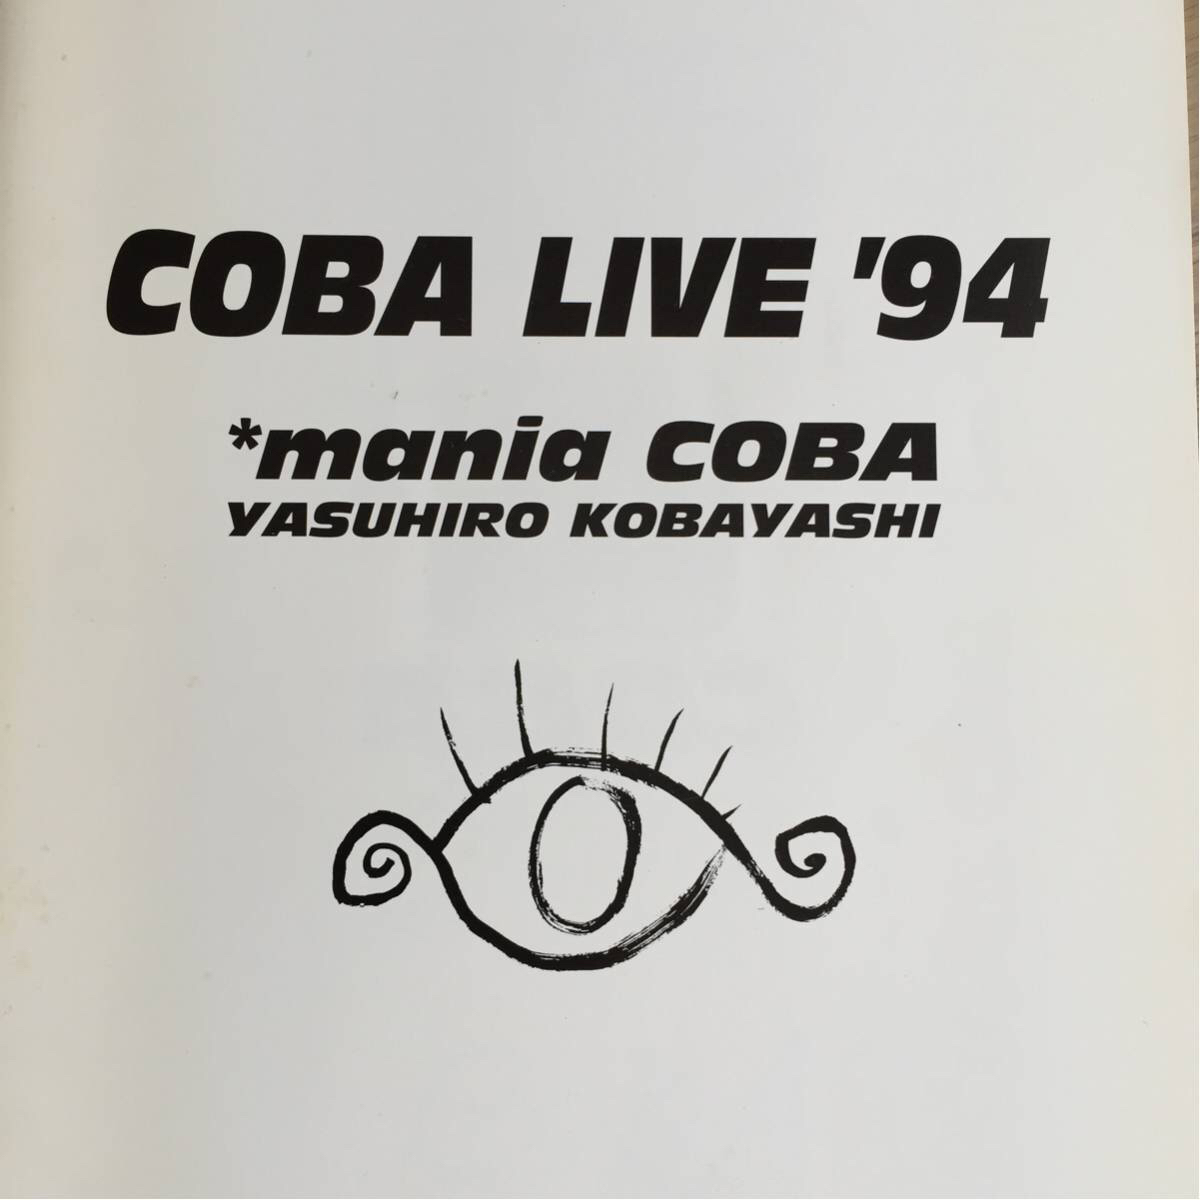 coba パンフレット 1994年ライブ 小林靖広 アコーディオン